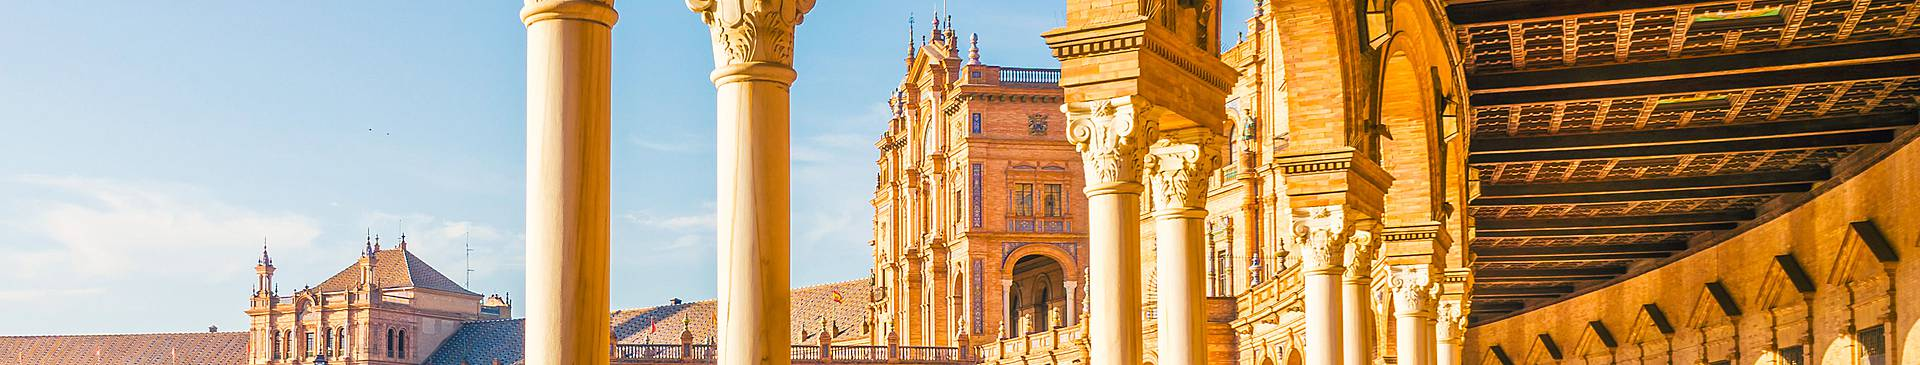 Une semaine en Espagne